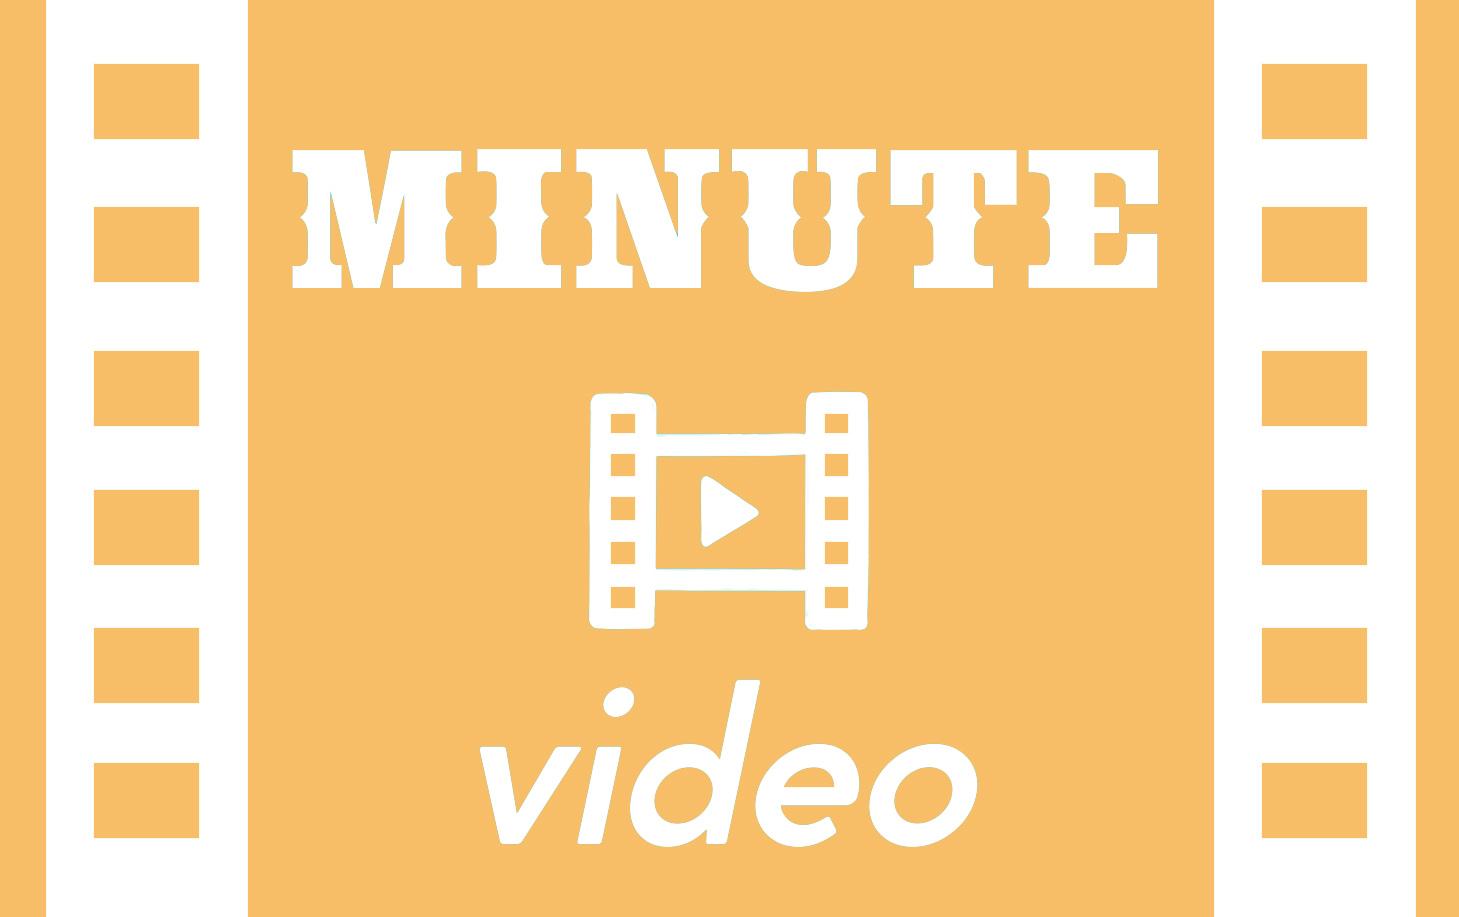 VIDEO MINUTE taronja